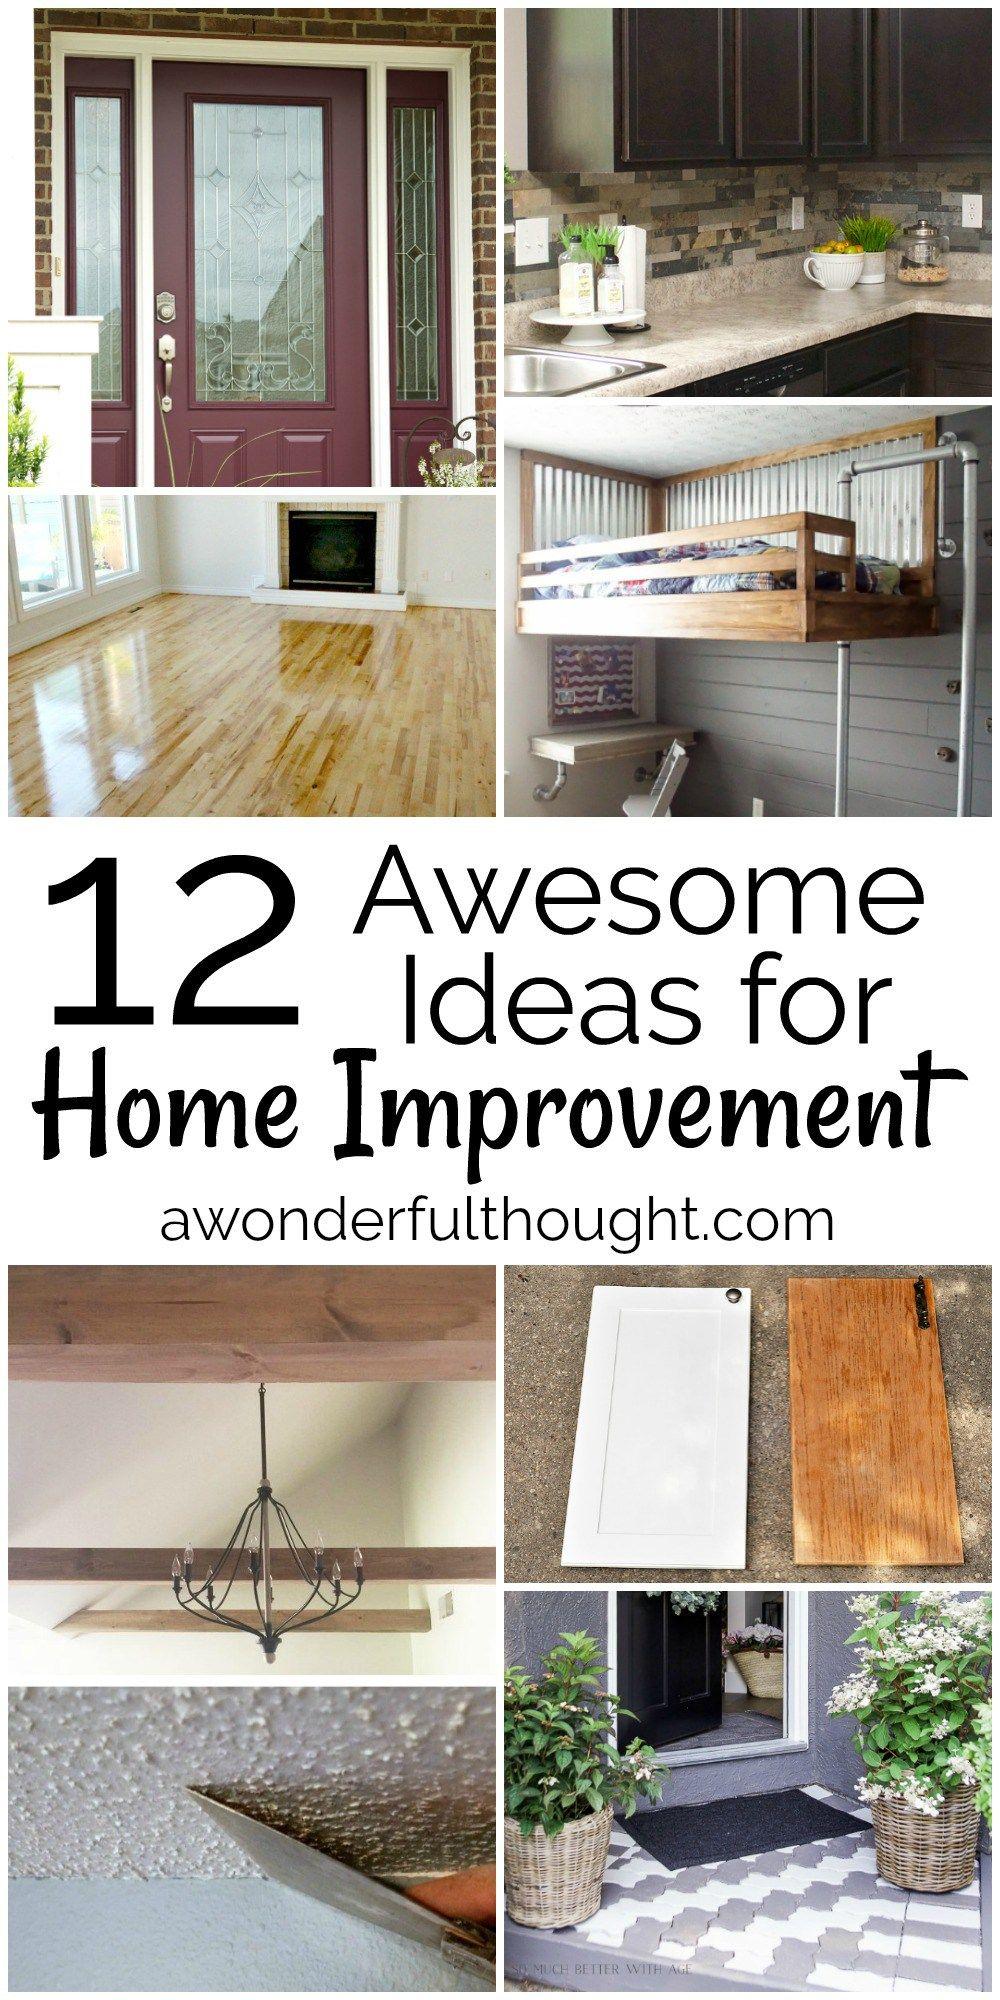 Image result for Home Improvement Ideas | Home Decor | Pinterest ...